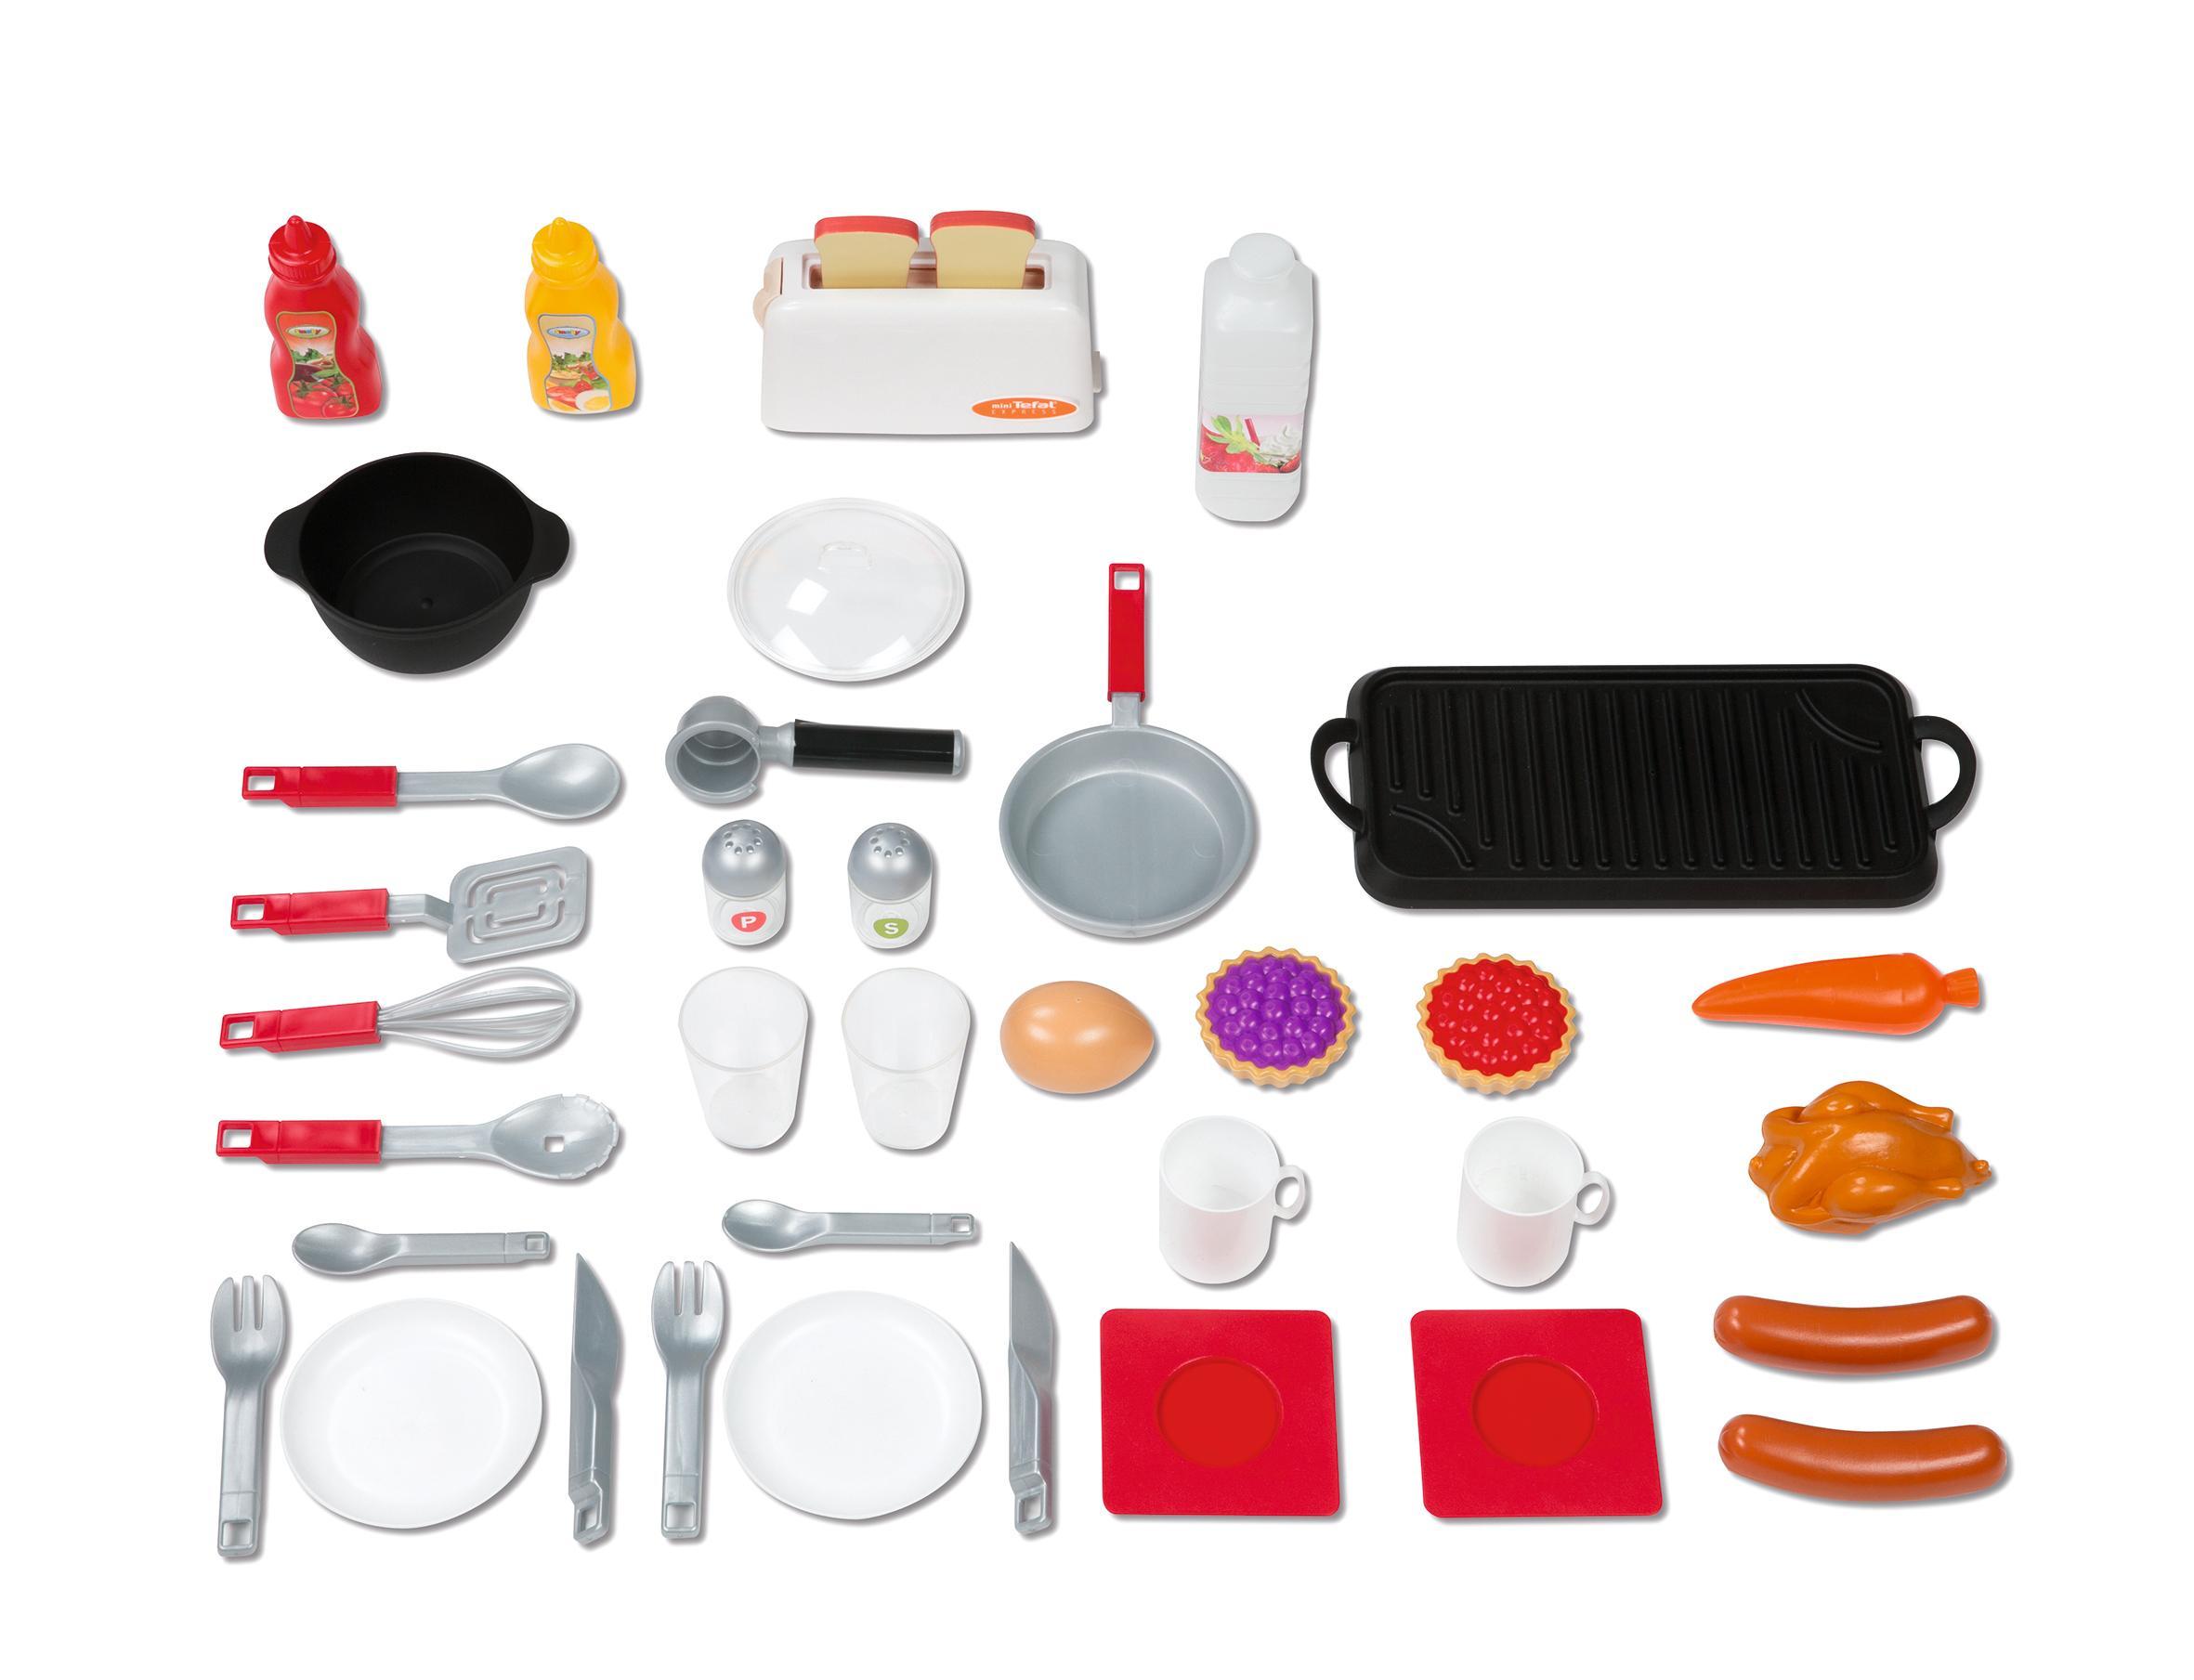 Smoby 24667 - Tefal Super Chef Küche: Amazon.de: Spielzeug